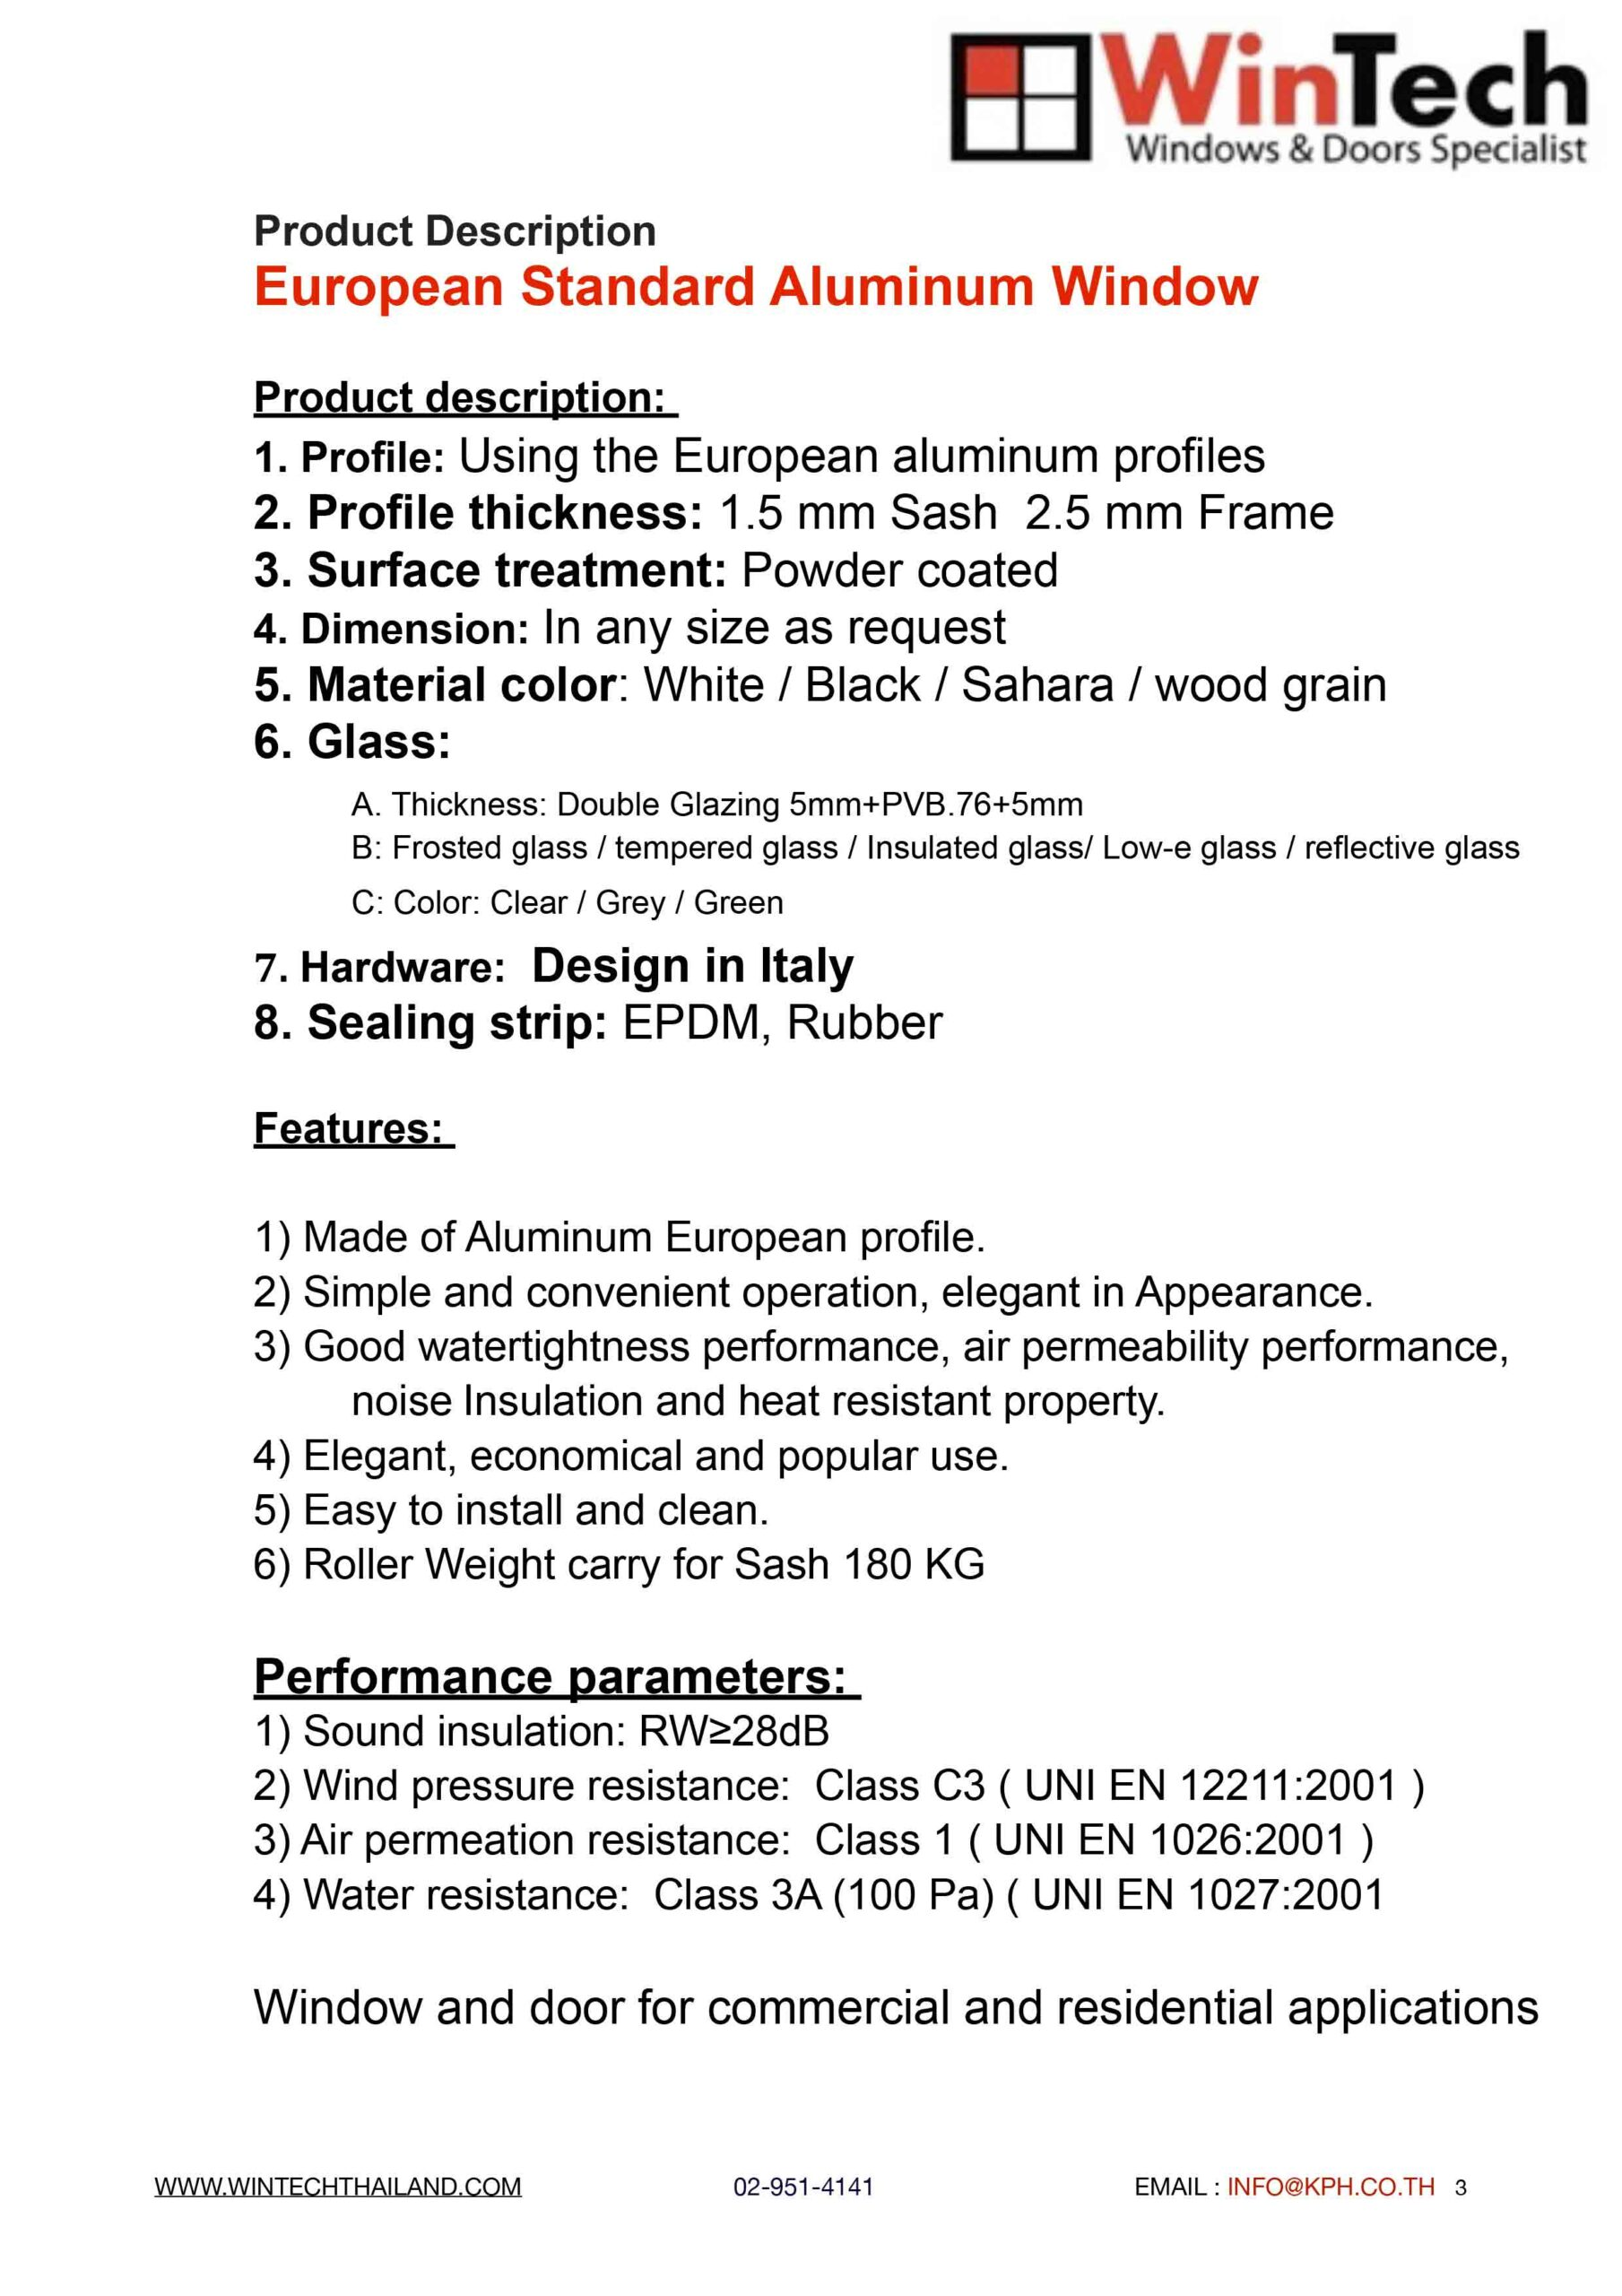 Wintech-Italy-Brochure-commp-3